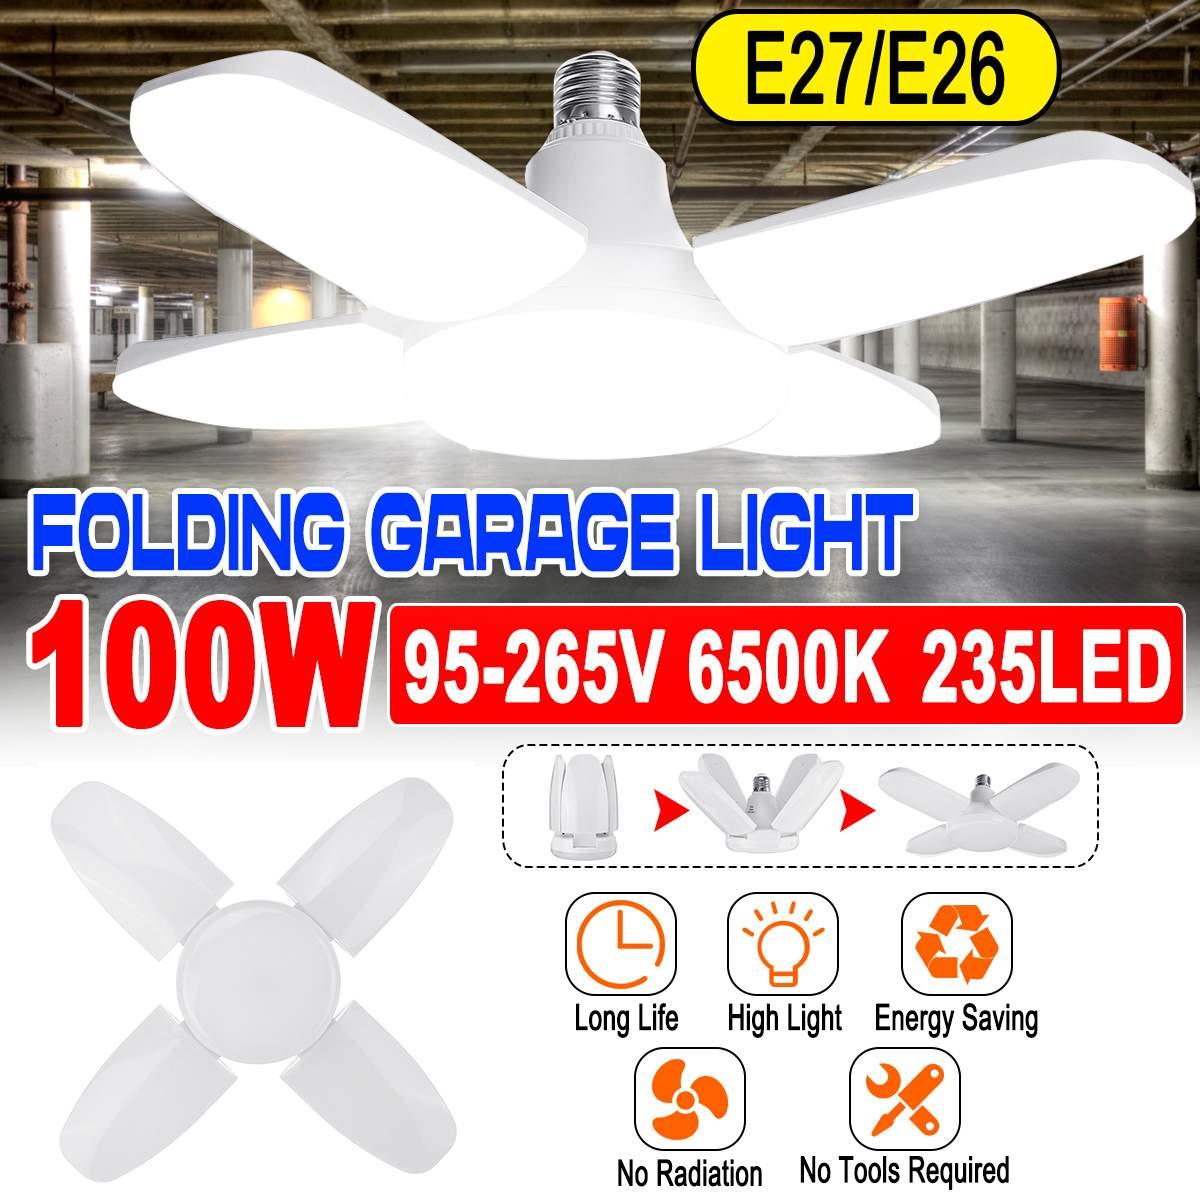 100W 6500K Foldable Led Garage Light E26/E27 235 Beads Lamps Industrial Deformation Lamp Flying Saucer Four Leaves Bulb